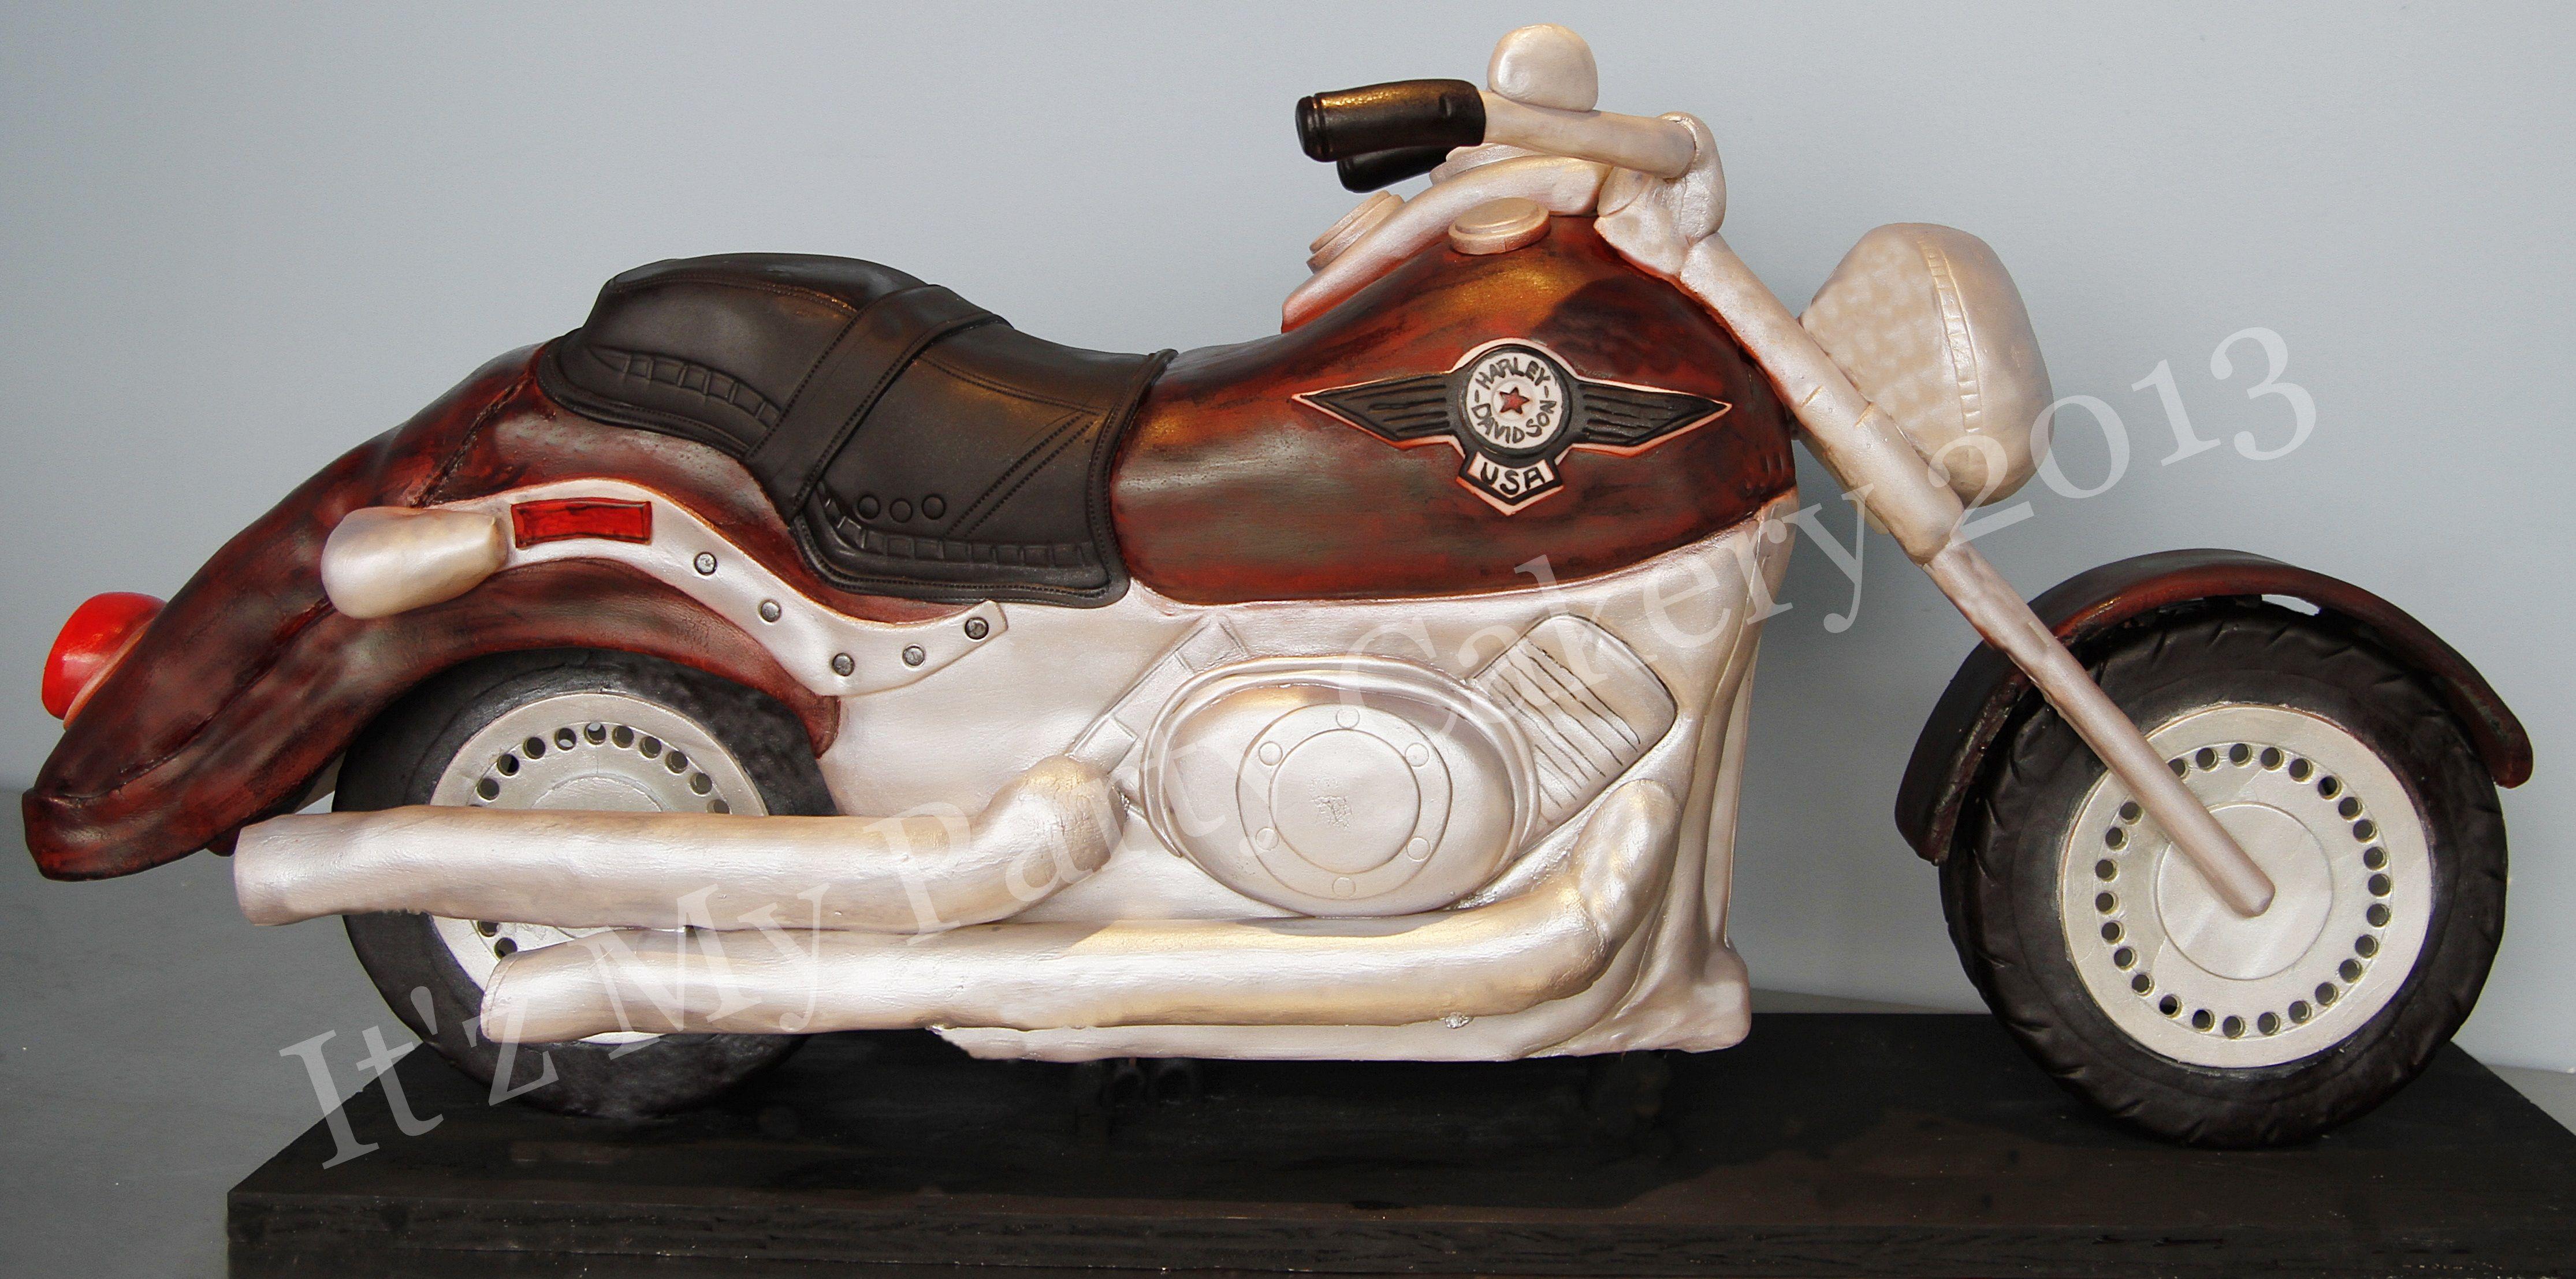 Edible Cake Images Harley Davidson : Harley Davidson Edible Cake Ideas and Designs